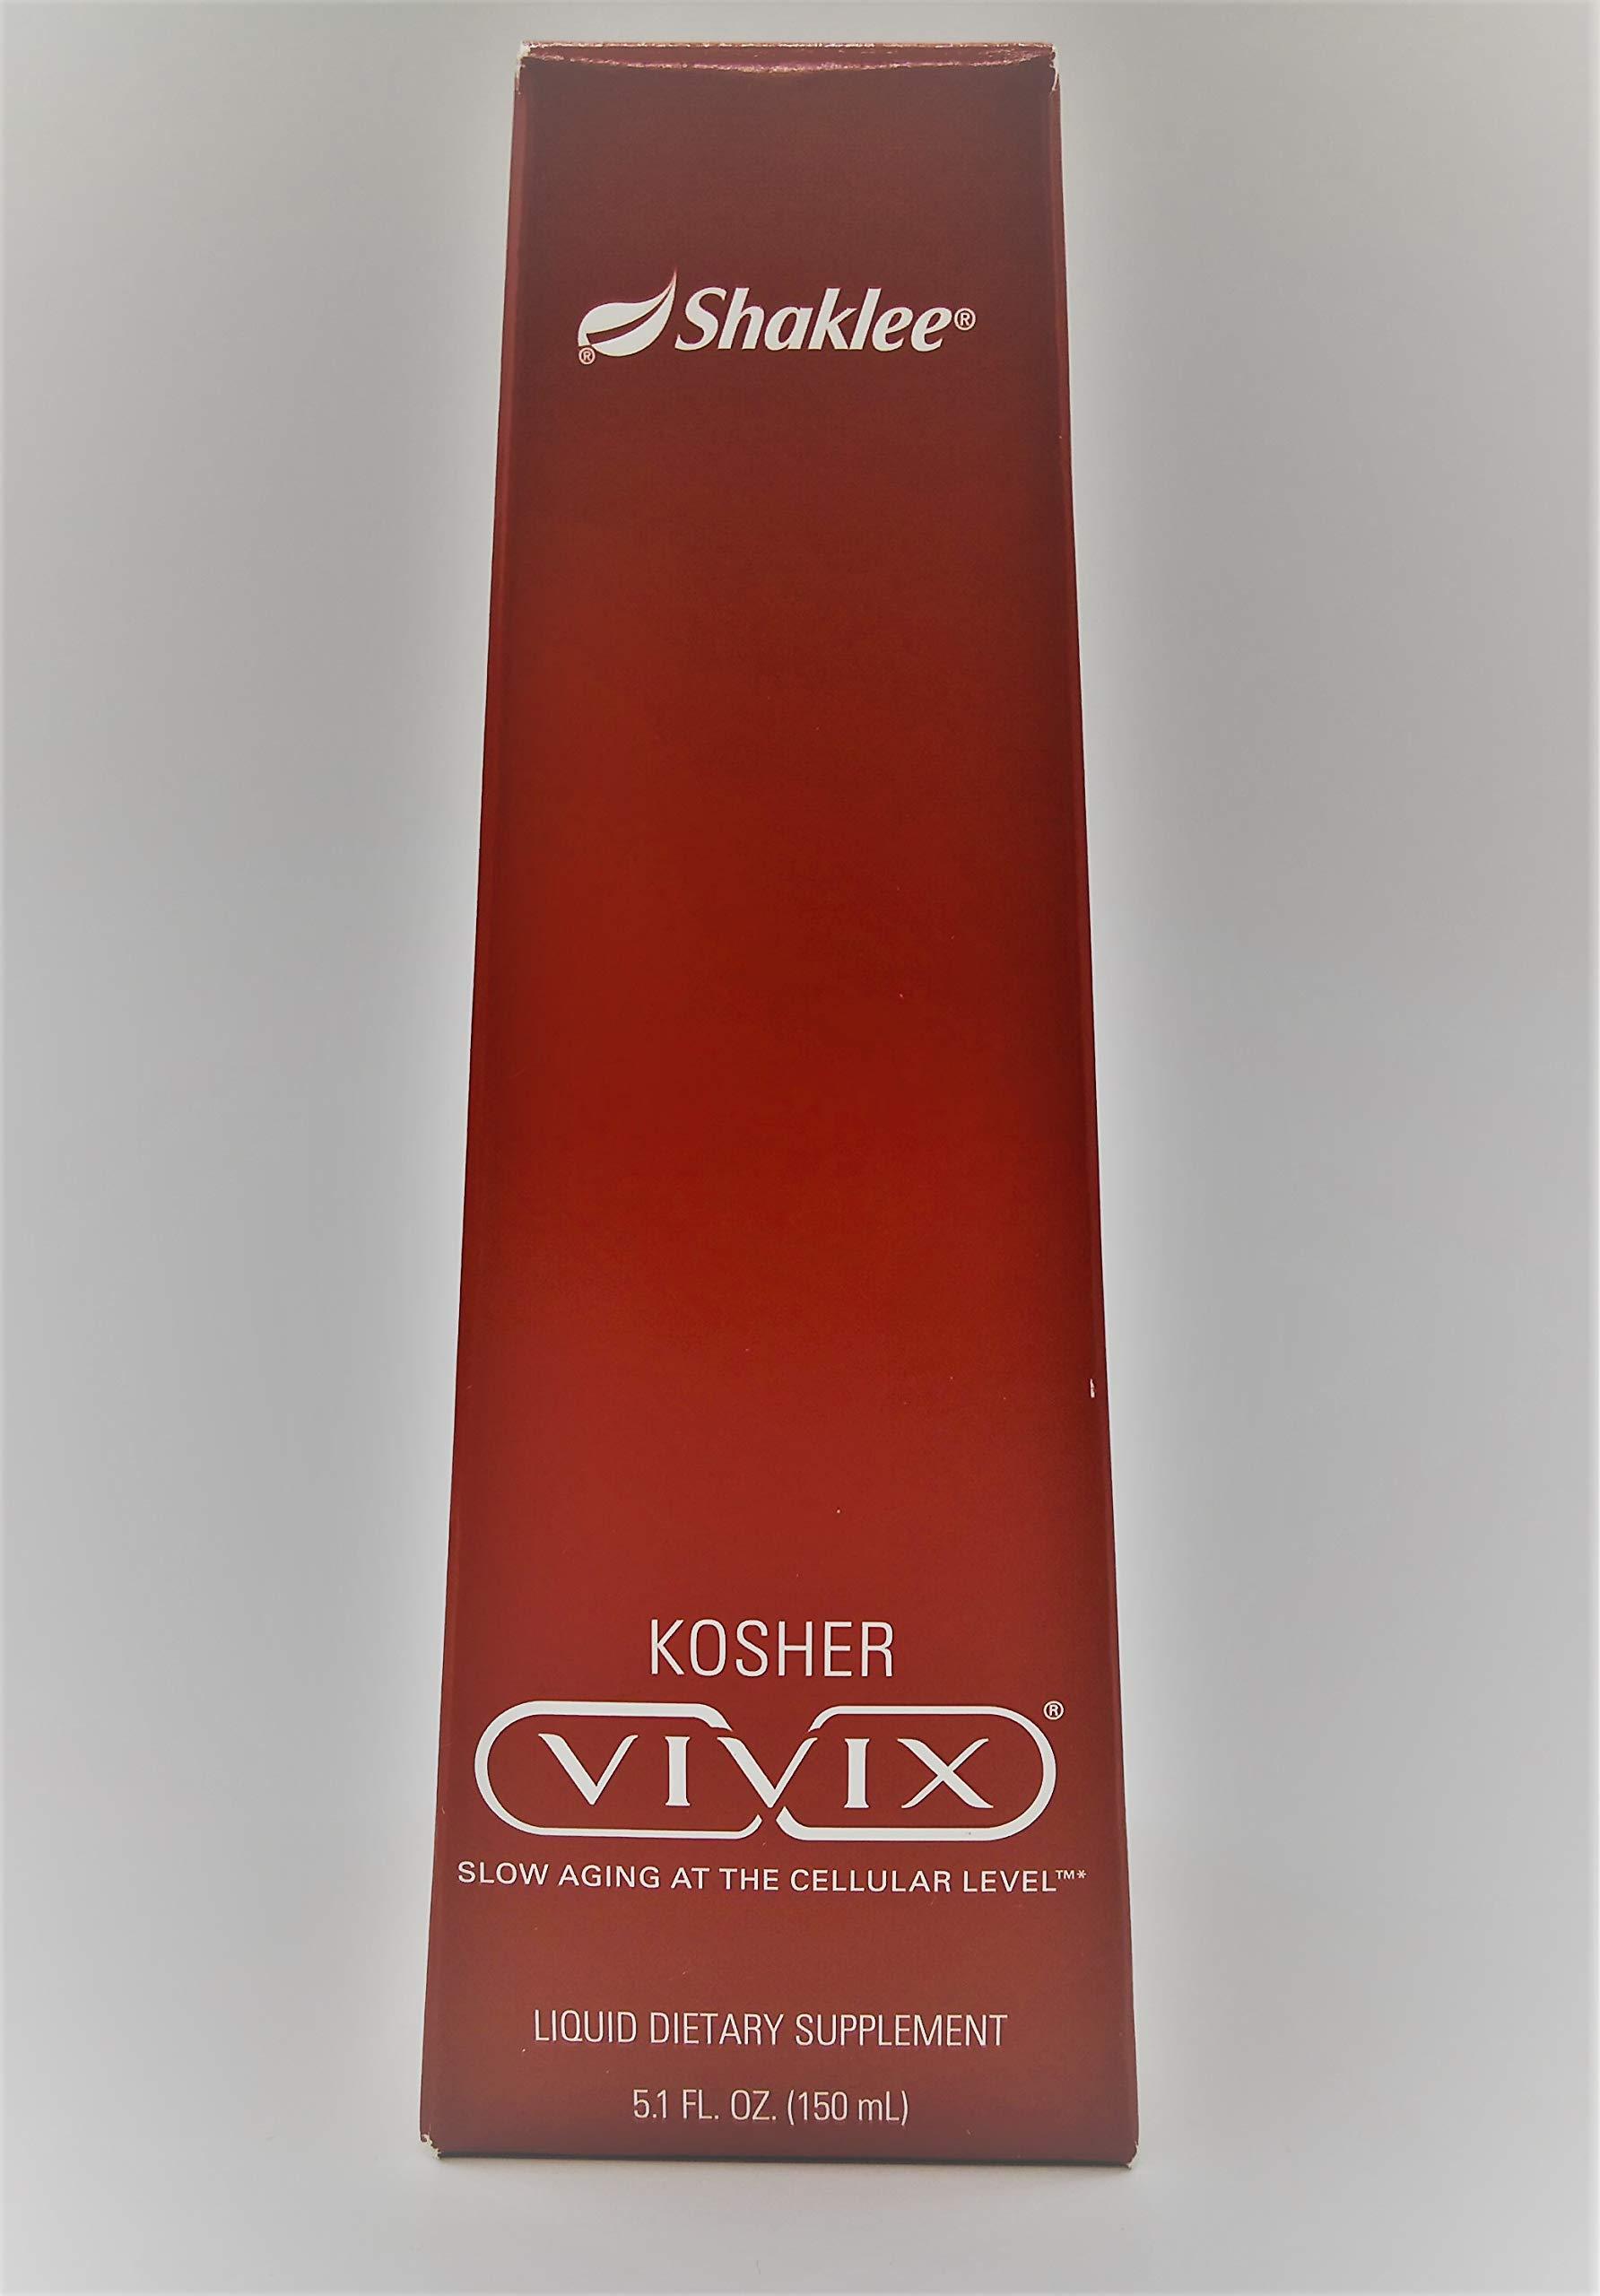 Shaklee Vivix Kosher Liquid Dietary Supplement 5.1 FL. OZ.